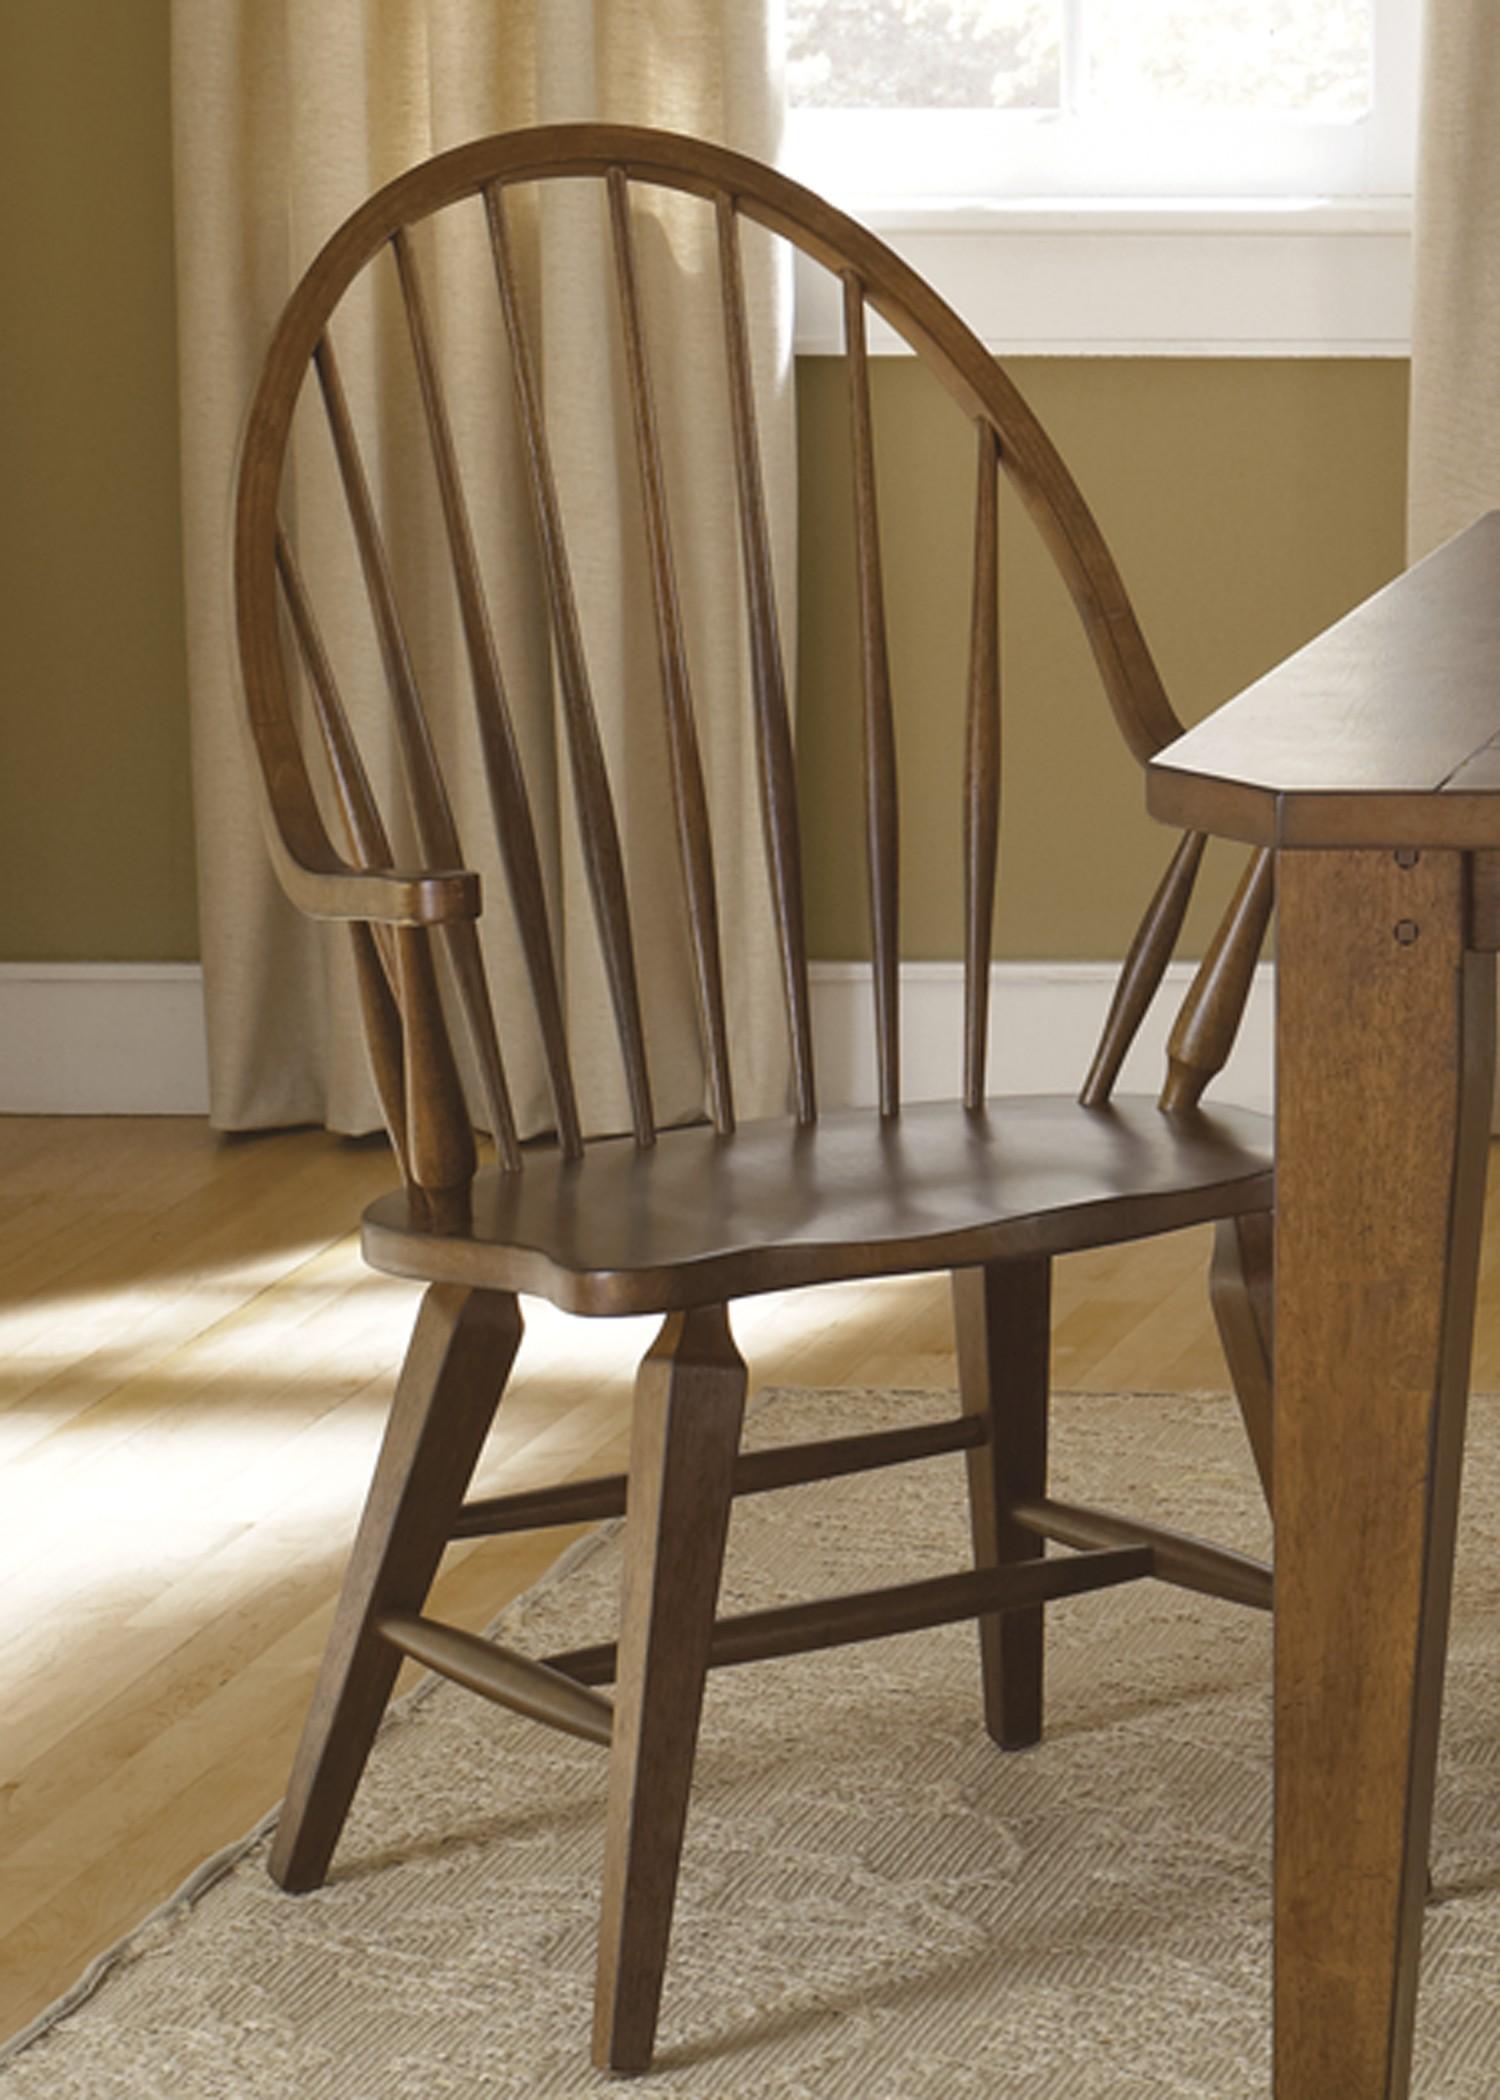 Hearthstone rustic oak windsor back arm chair from liberty